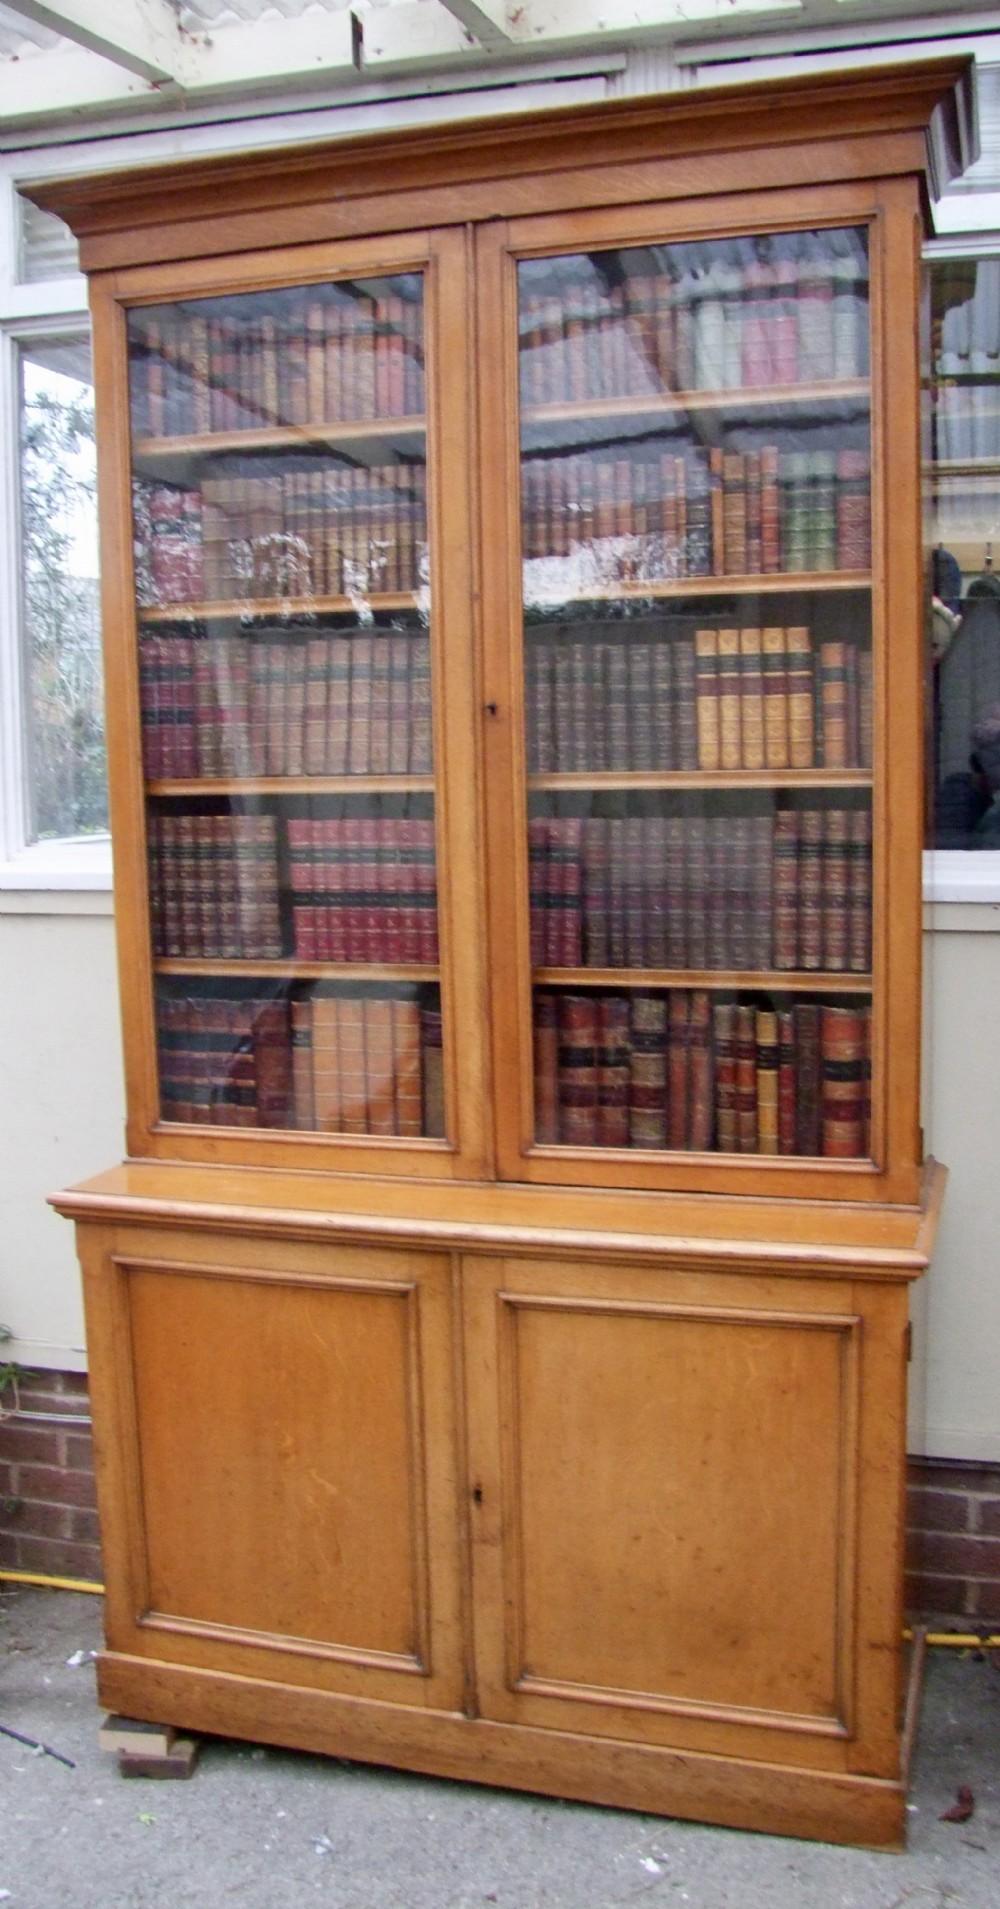 19th century cupboard bookcase in golden oak